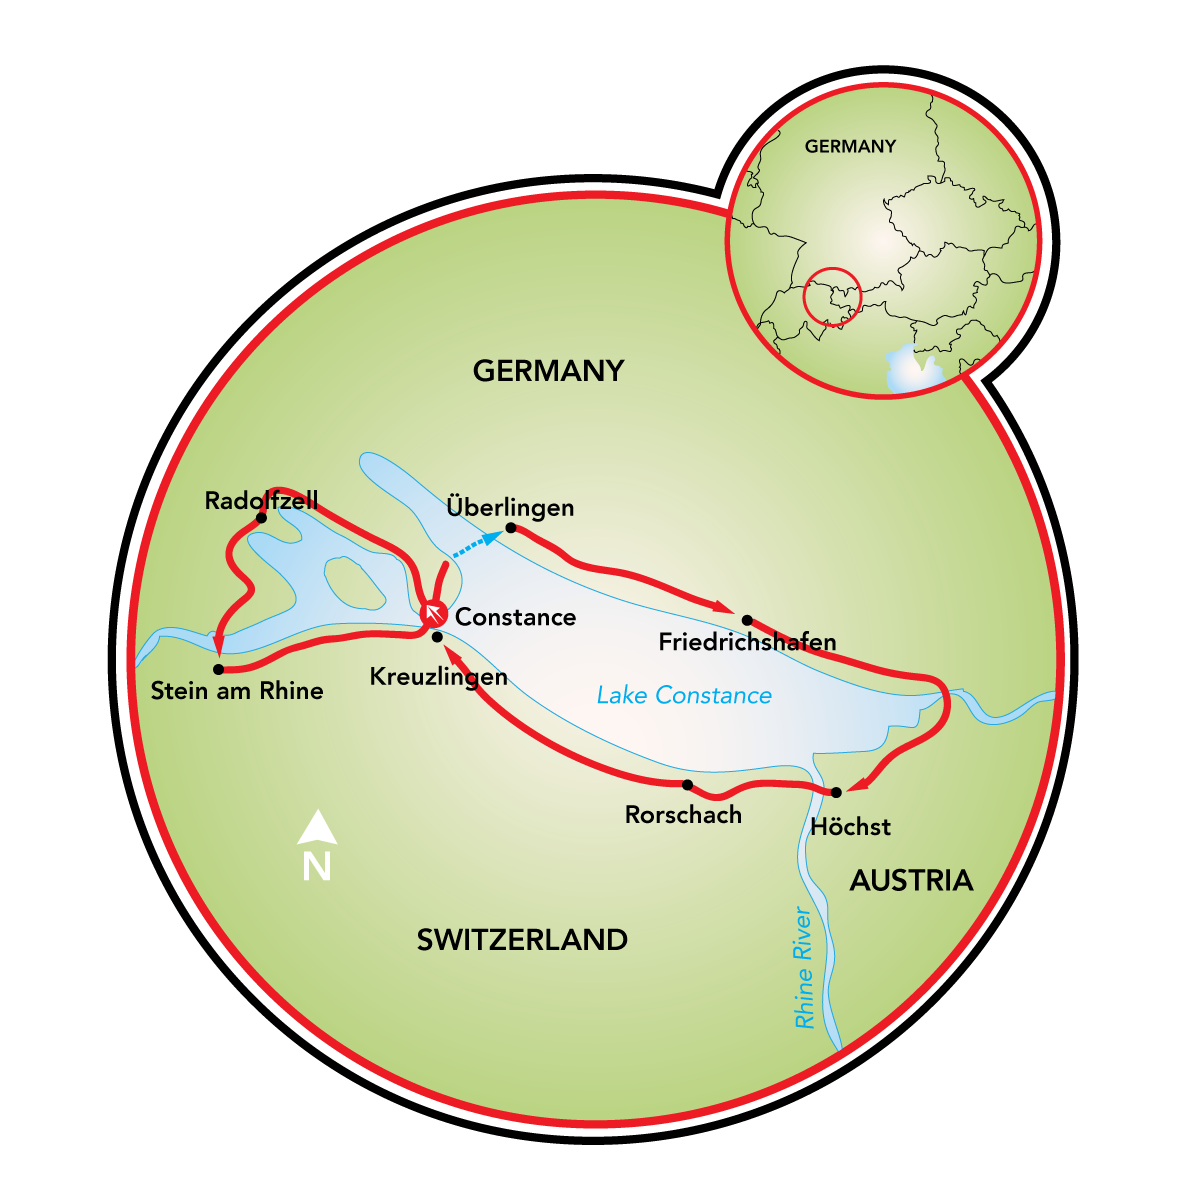 Konstanz Germany Map Directions Walking on plochingen germany map, bad sachsa germany map, neuenstein germany map, staufen im breisgau germany map, esens germany map, weil der stadt germany map, bad lippspringe germany map, straubenhardt germany map, lampertheim germany map, eberstadt germany map, ochtrup germany map, hohenzollern castle germany map, lengerich germany map, weissach germany map, goerlitz germany map, feuerbach germany map, black forest germany map, runkel germany map, landsberg am lech germany map,